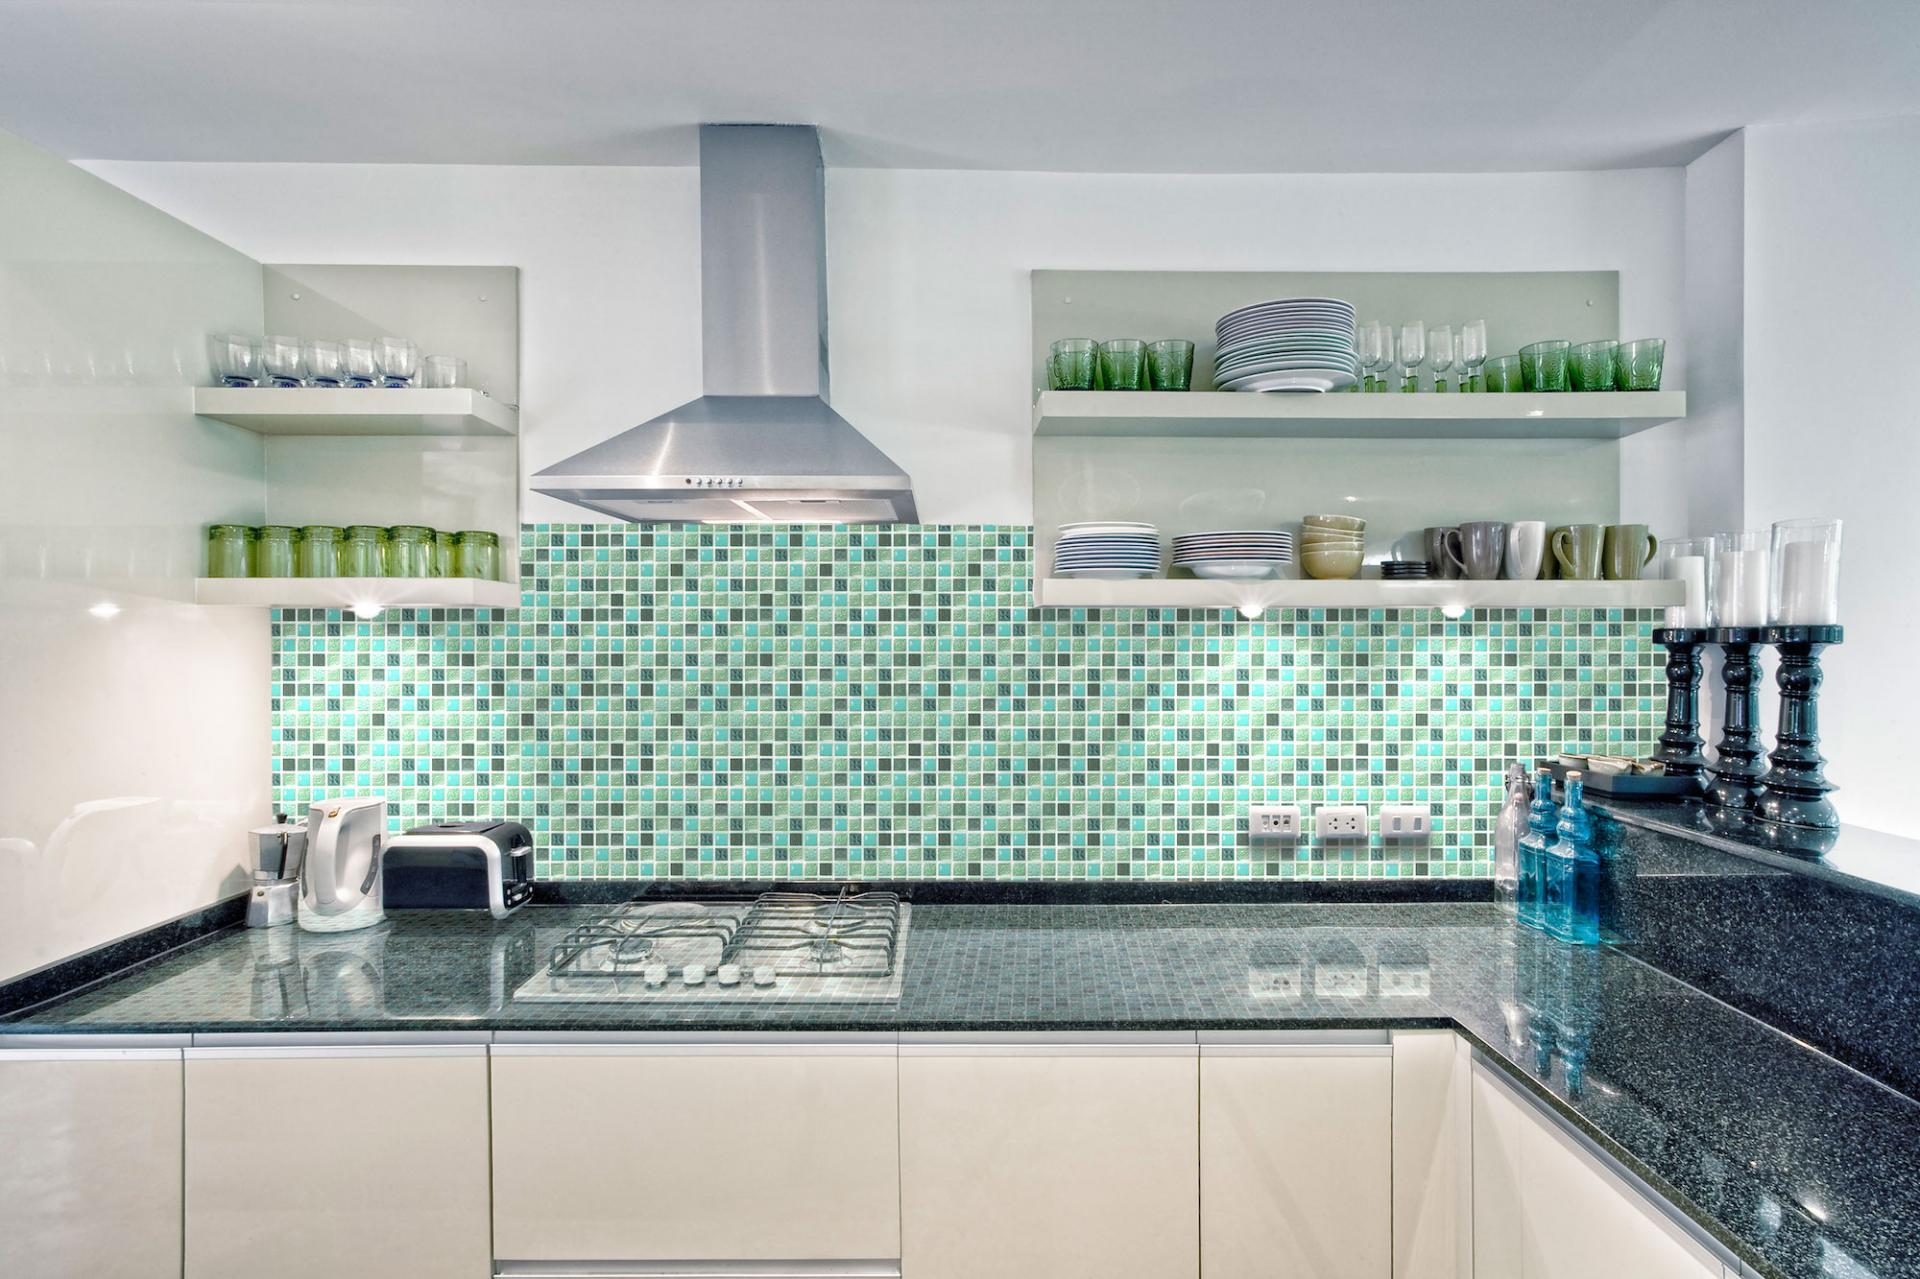 Mosaic provence